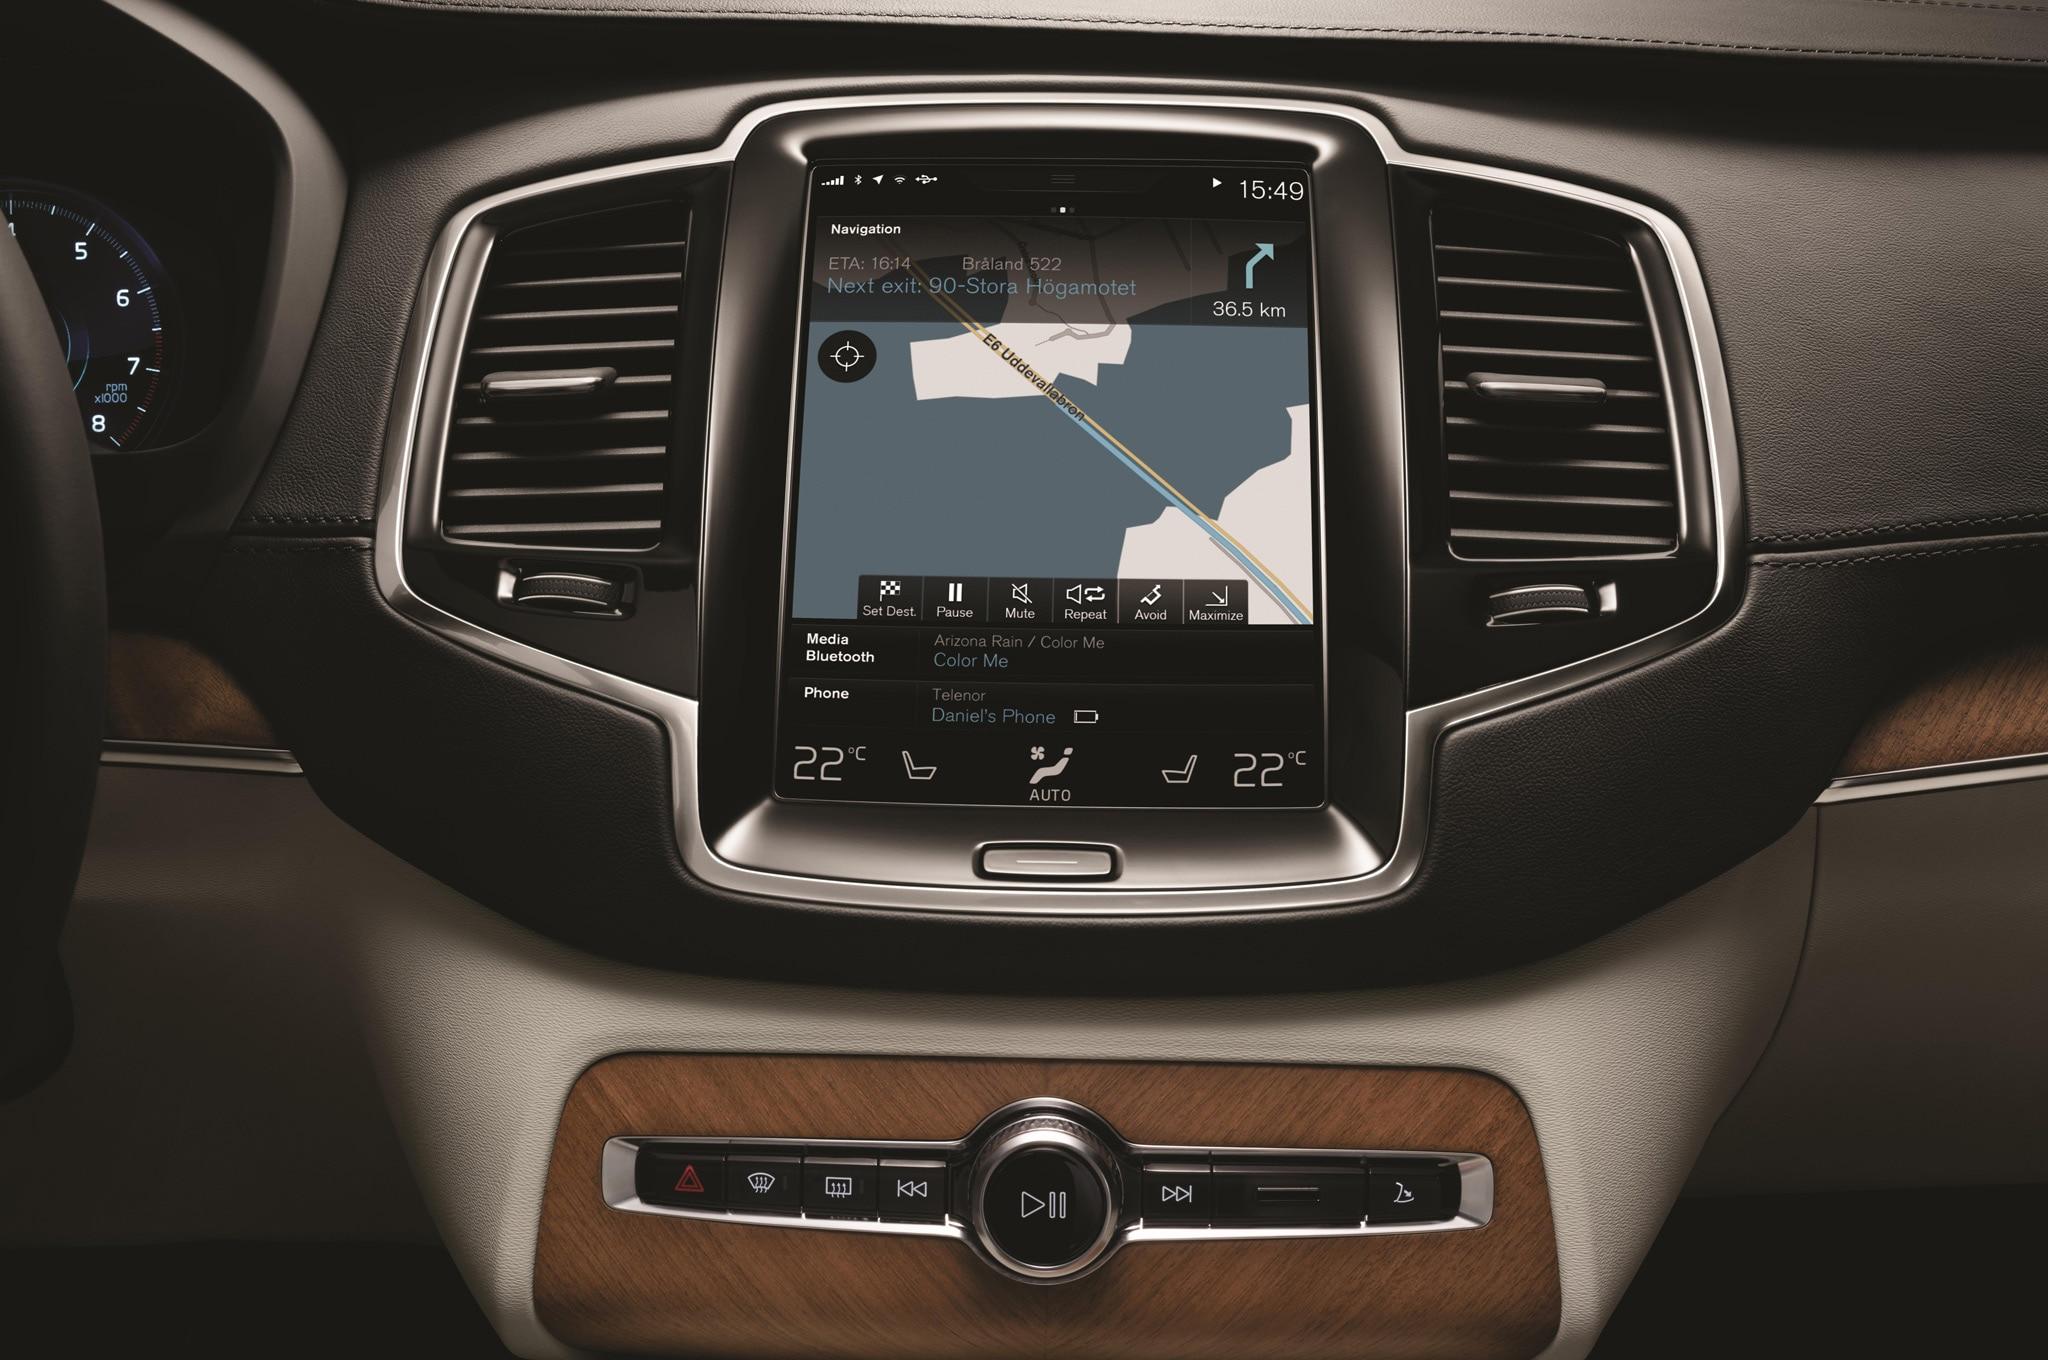 2015 volvo xc90 infotainment screen shown automobile. Black Bedroom Furniture Sets. Home Design Ideas